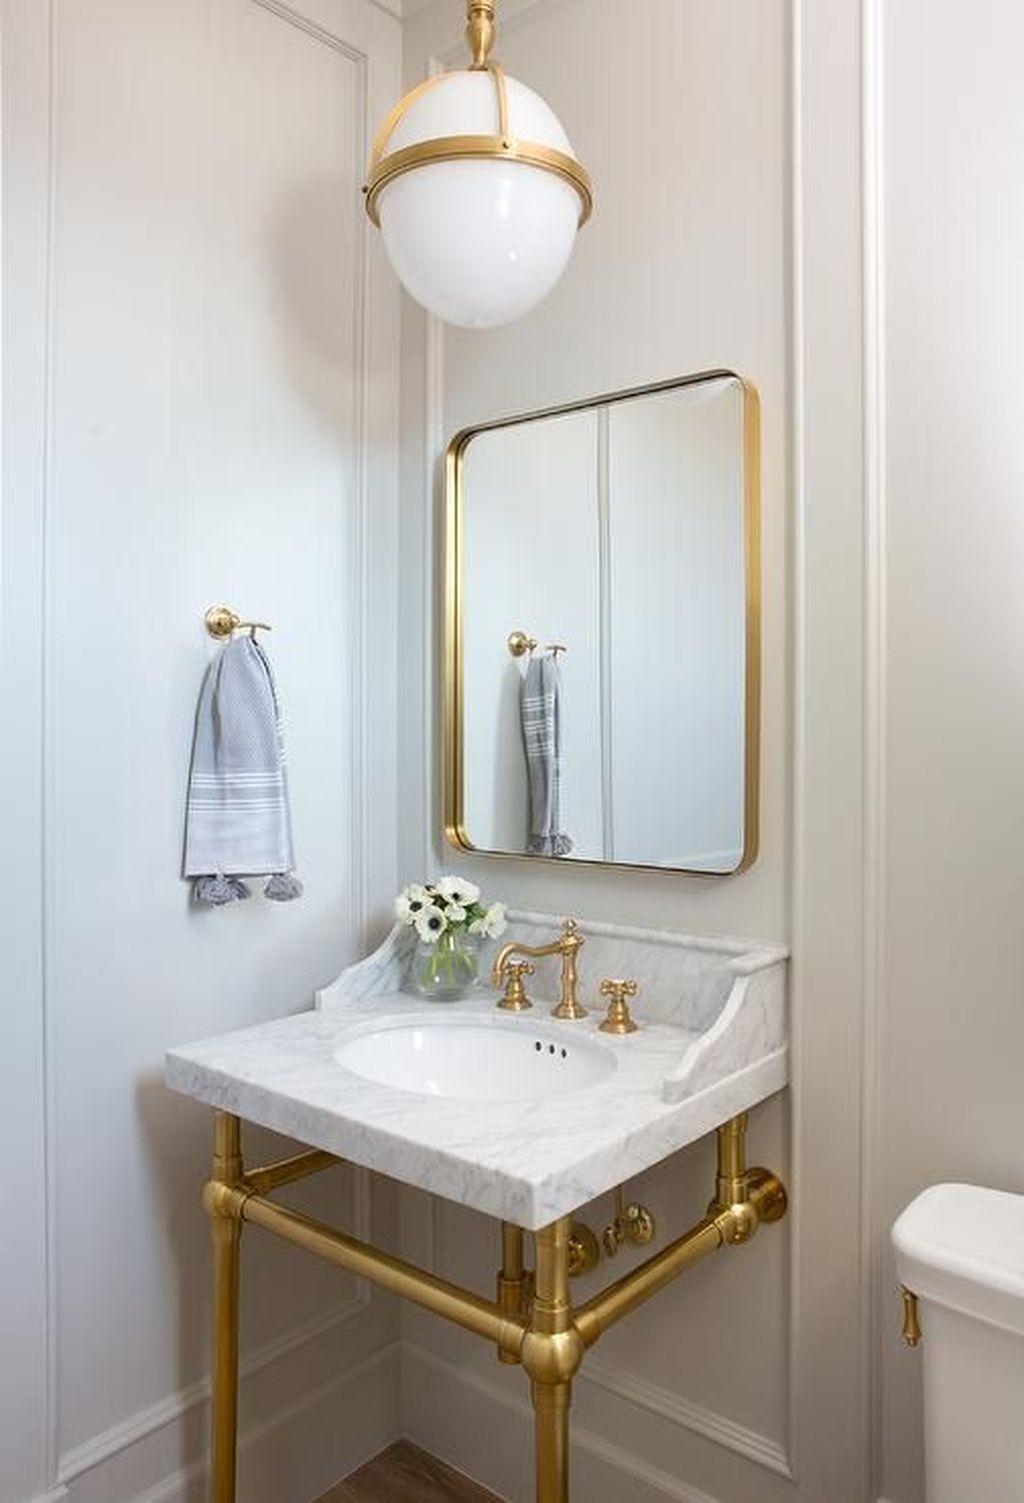 30 Inspiring Small Powder Room Decor And Design Ideas Trenduhome Powder Room Design Powder Room Decor Powder Room Small